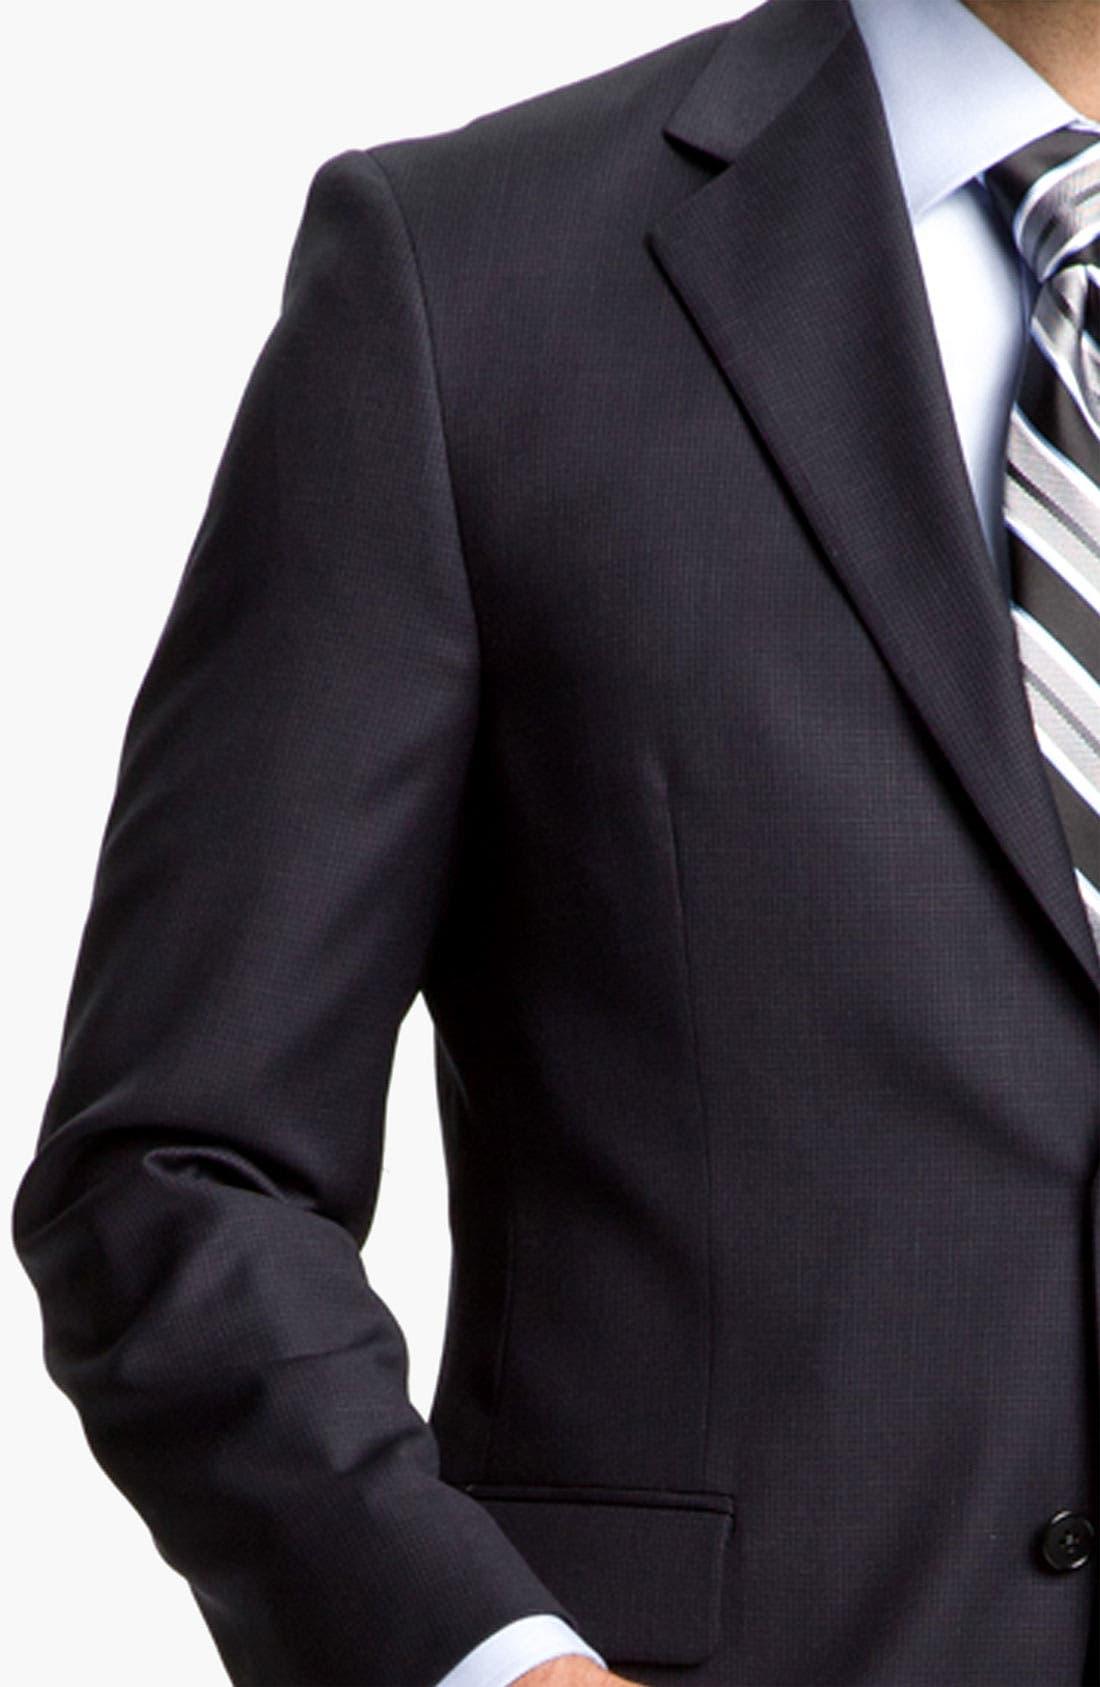 Alternate Image 3  - Joseph Abboud 'Profile Hybrid Signature' Wool Suit